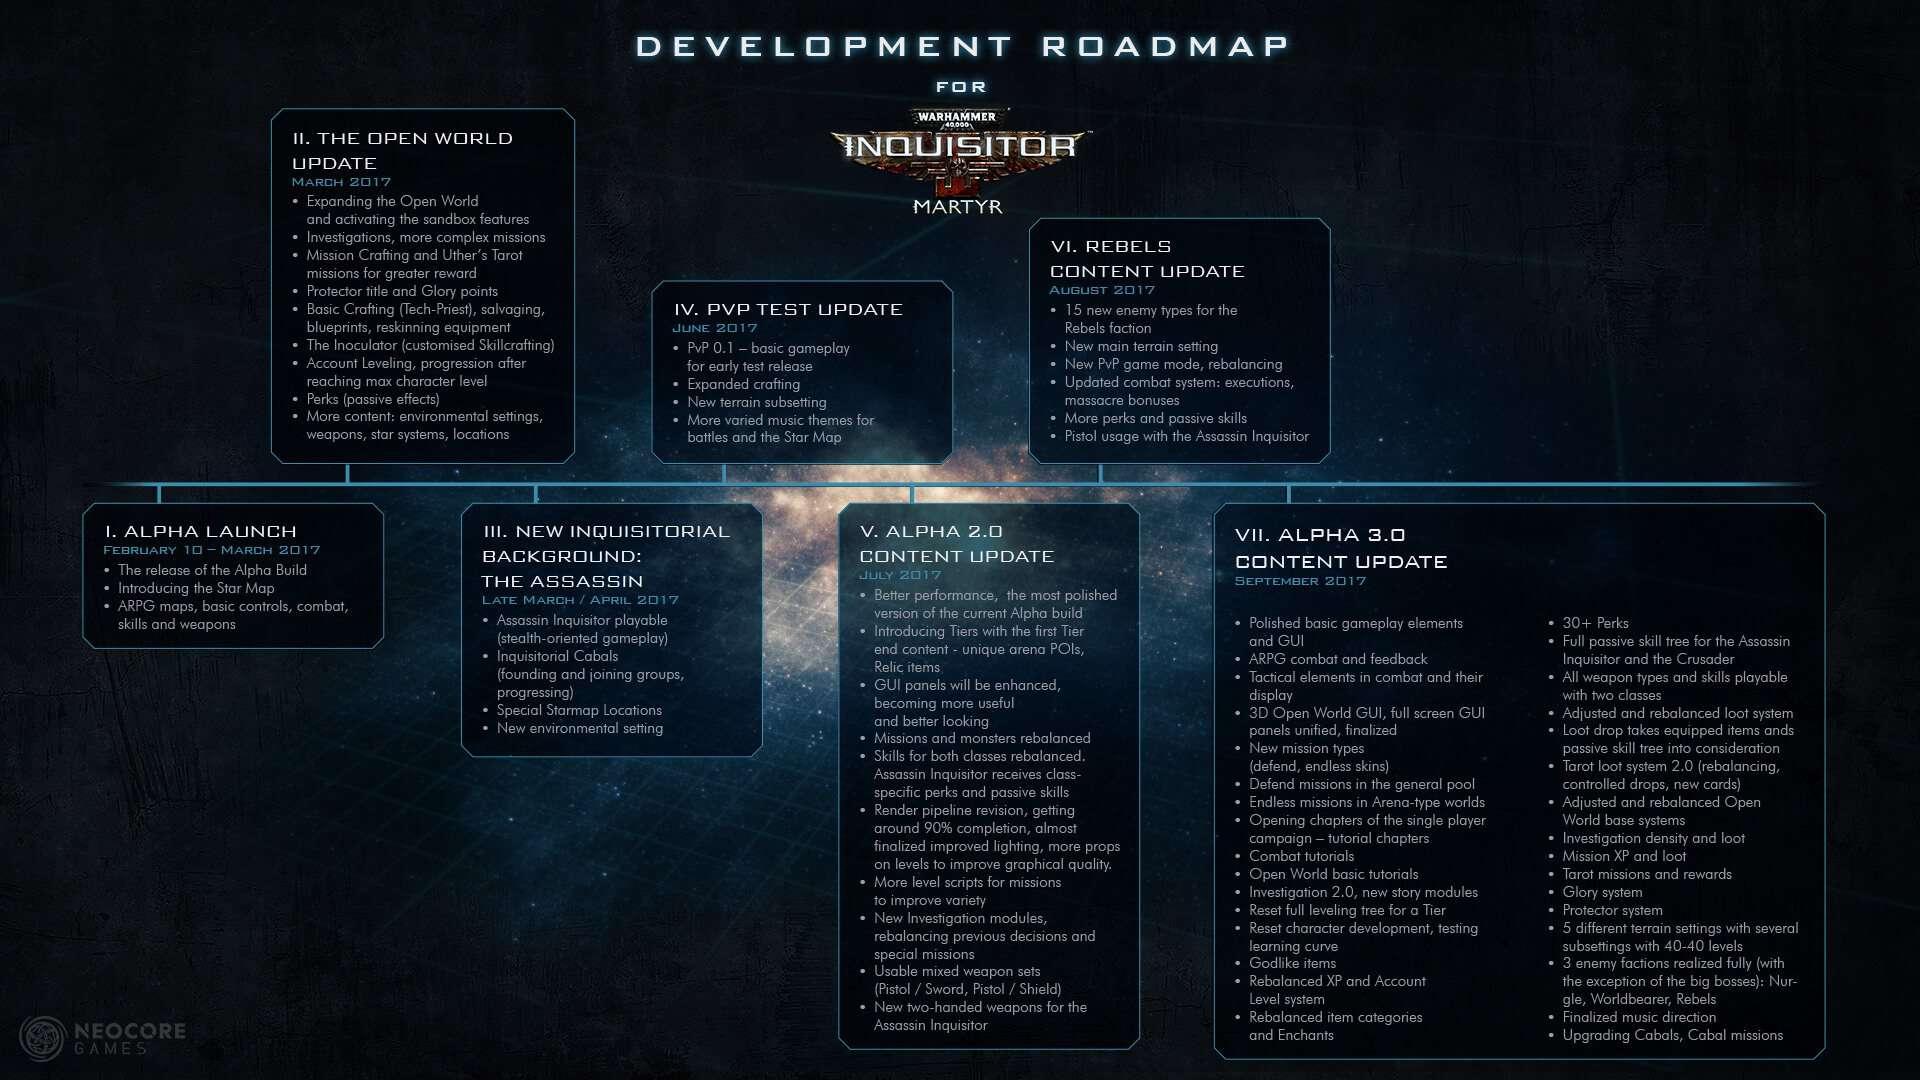 IMAGE(https://static.neocoregames.com/images/roadmap/W40K_Roadmap_01.jpg)